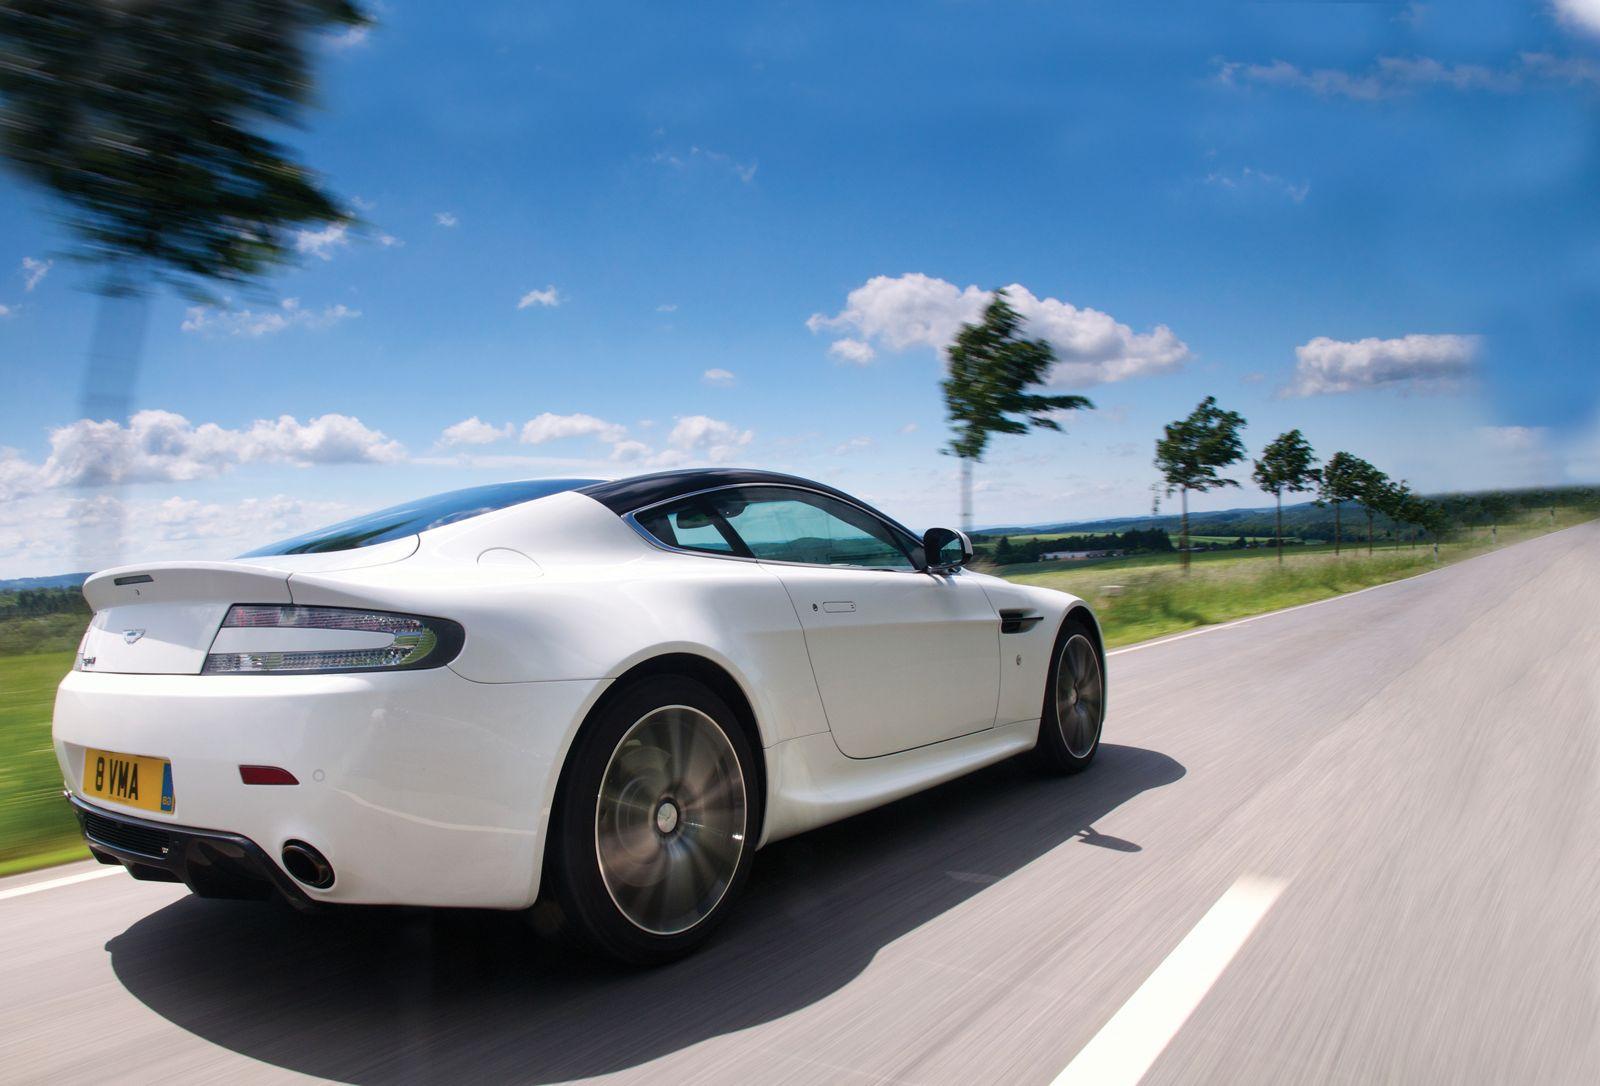 Aston Martin Presenta Su V8 Vantage N420